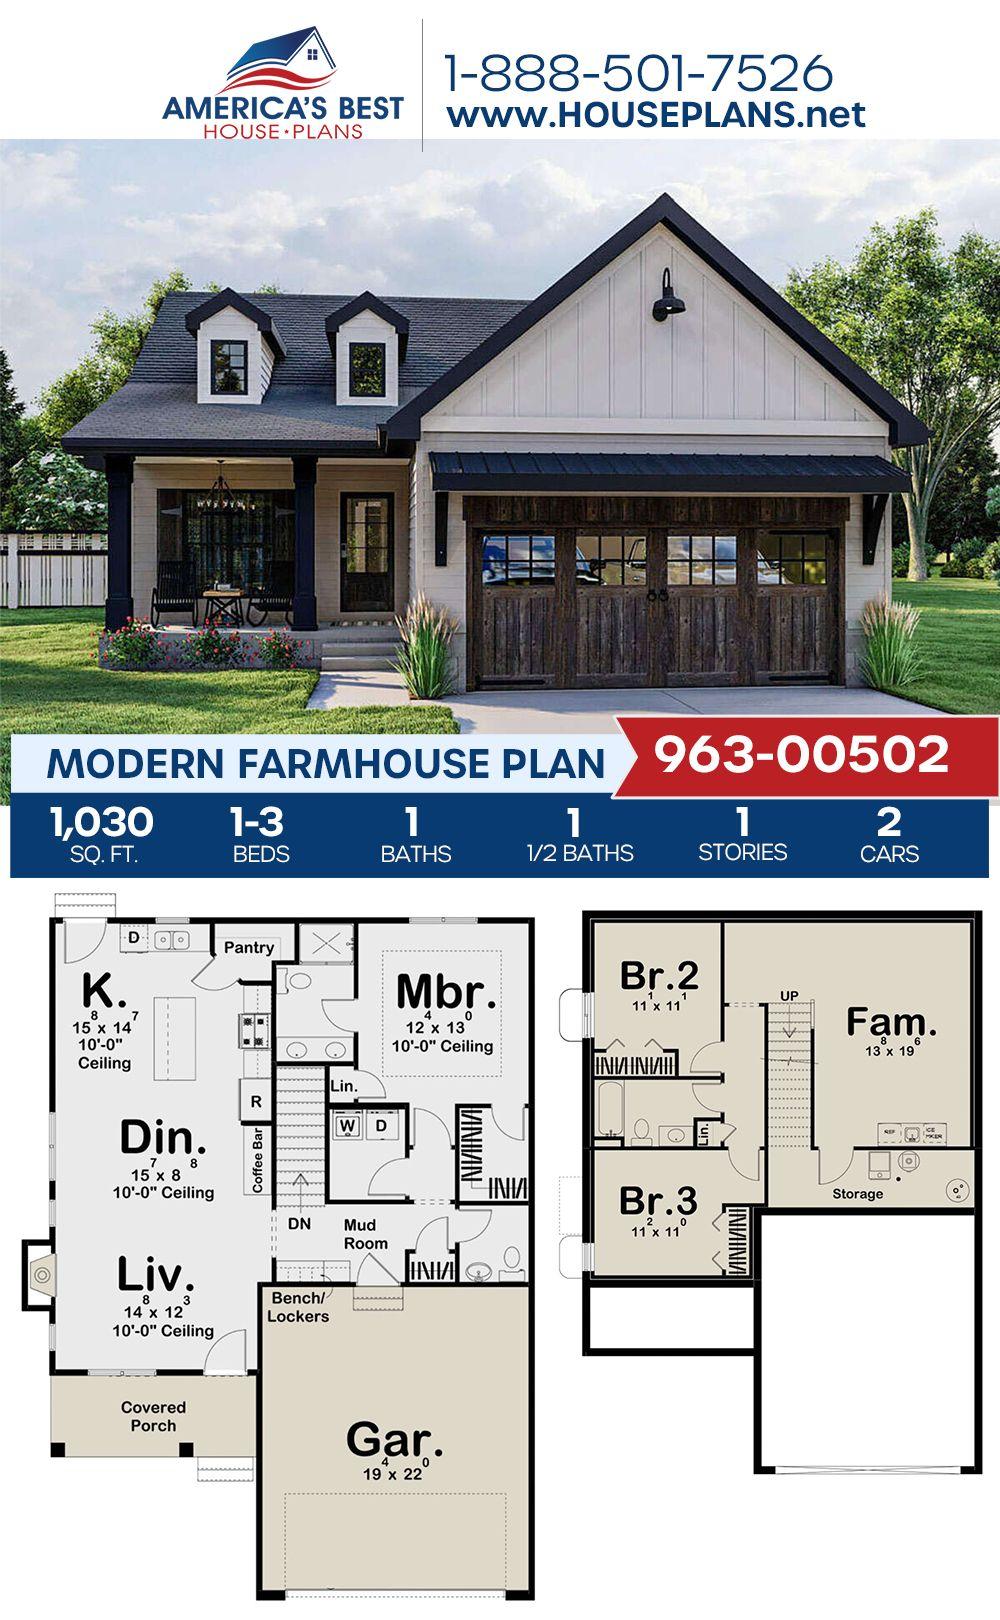 House Plan 963 00502 Modern Farmhouse Plan 1 030 Square Feet 1 3 Bedrooms 1 5 Bathrooms Modern Farmhouse Plans Farmhouse Plans House Plans